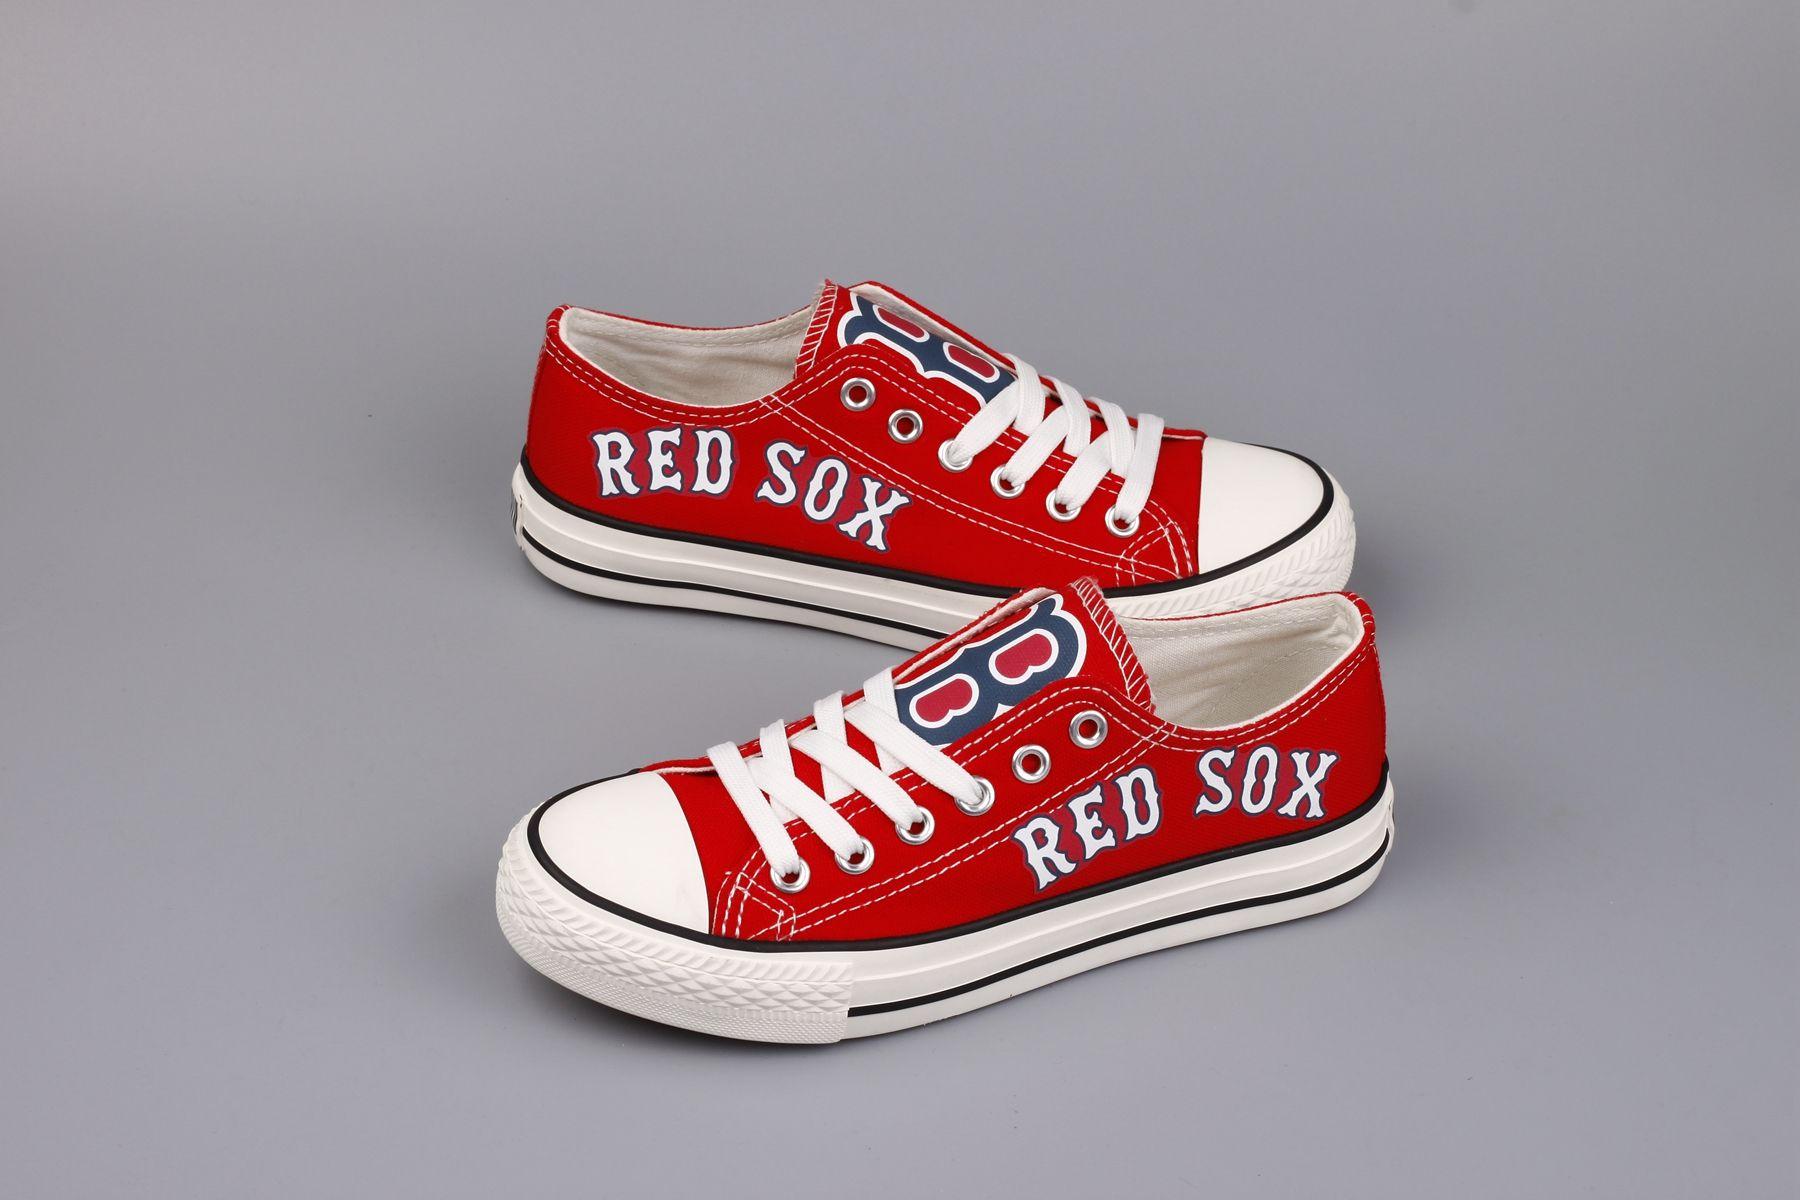 Boston red sox shoes, Dallas cowboys shoes